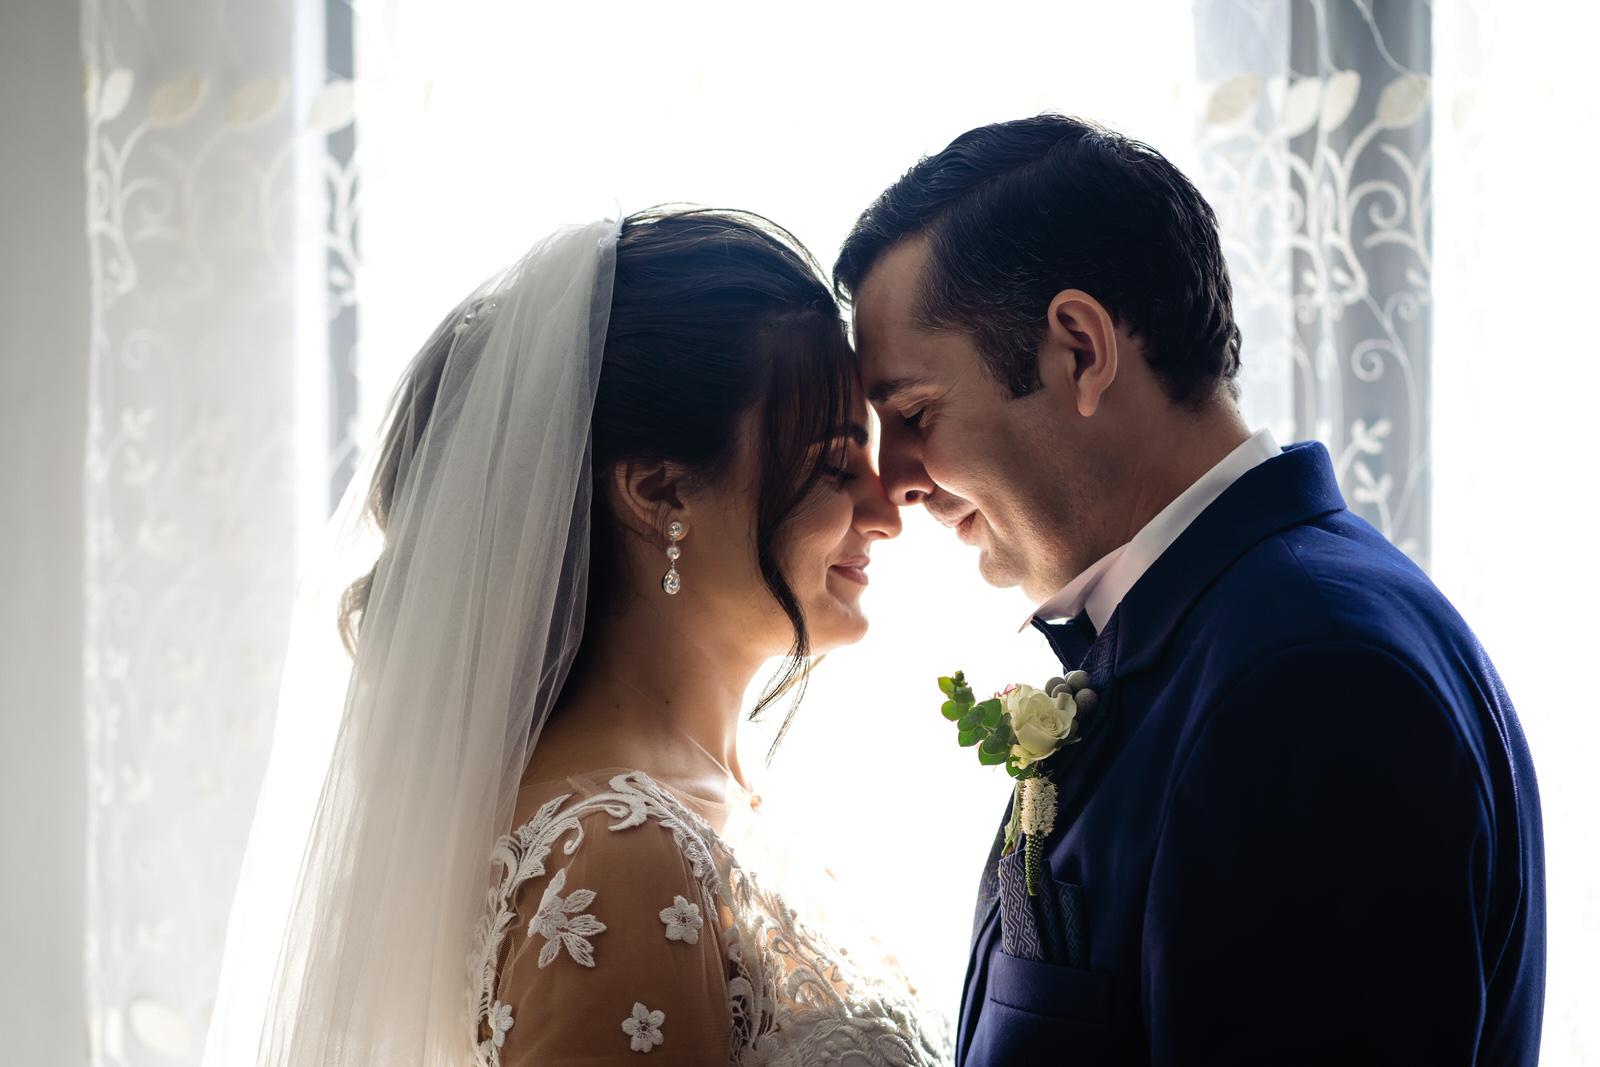 Nunta noastra, Maria și Alexandru